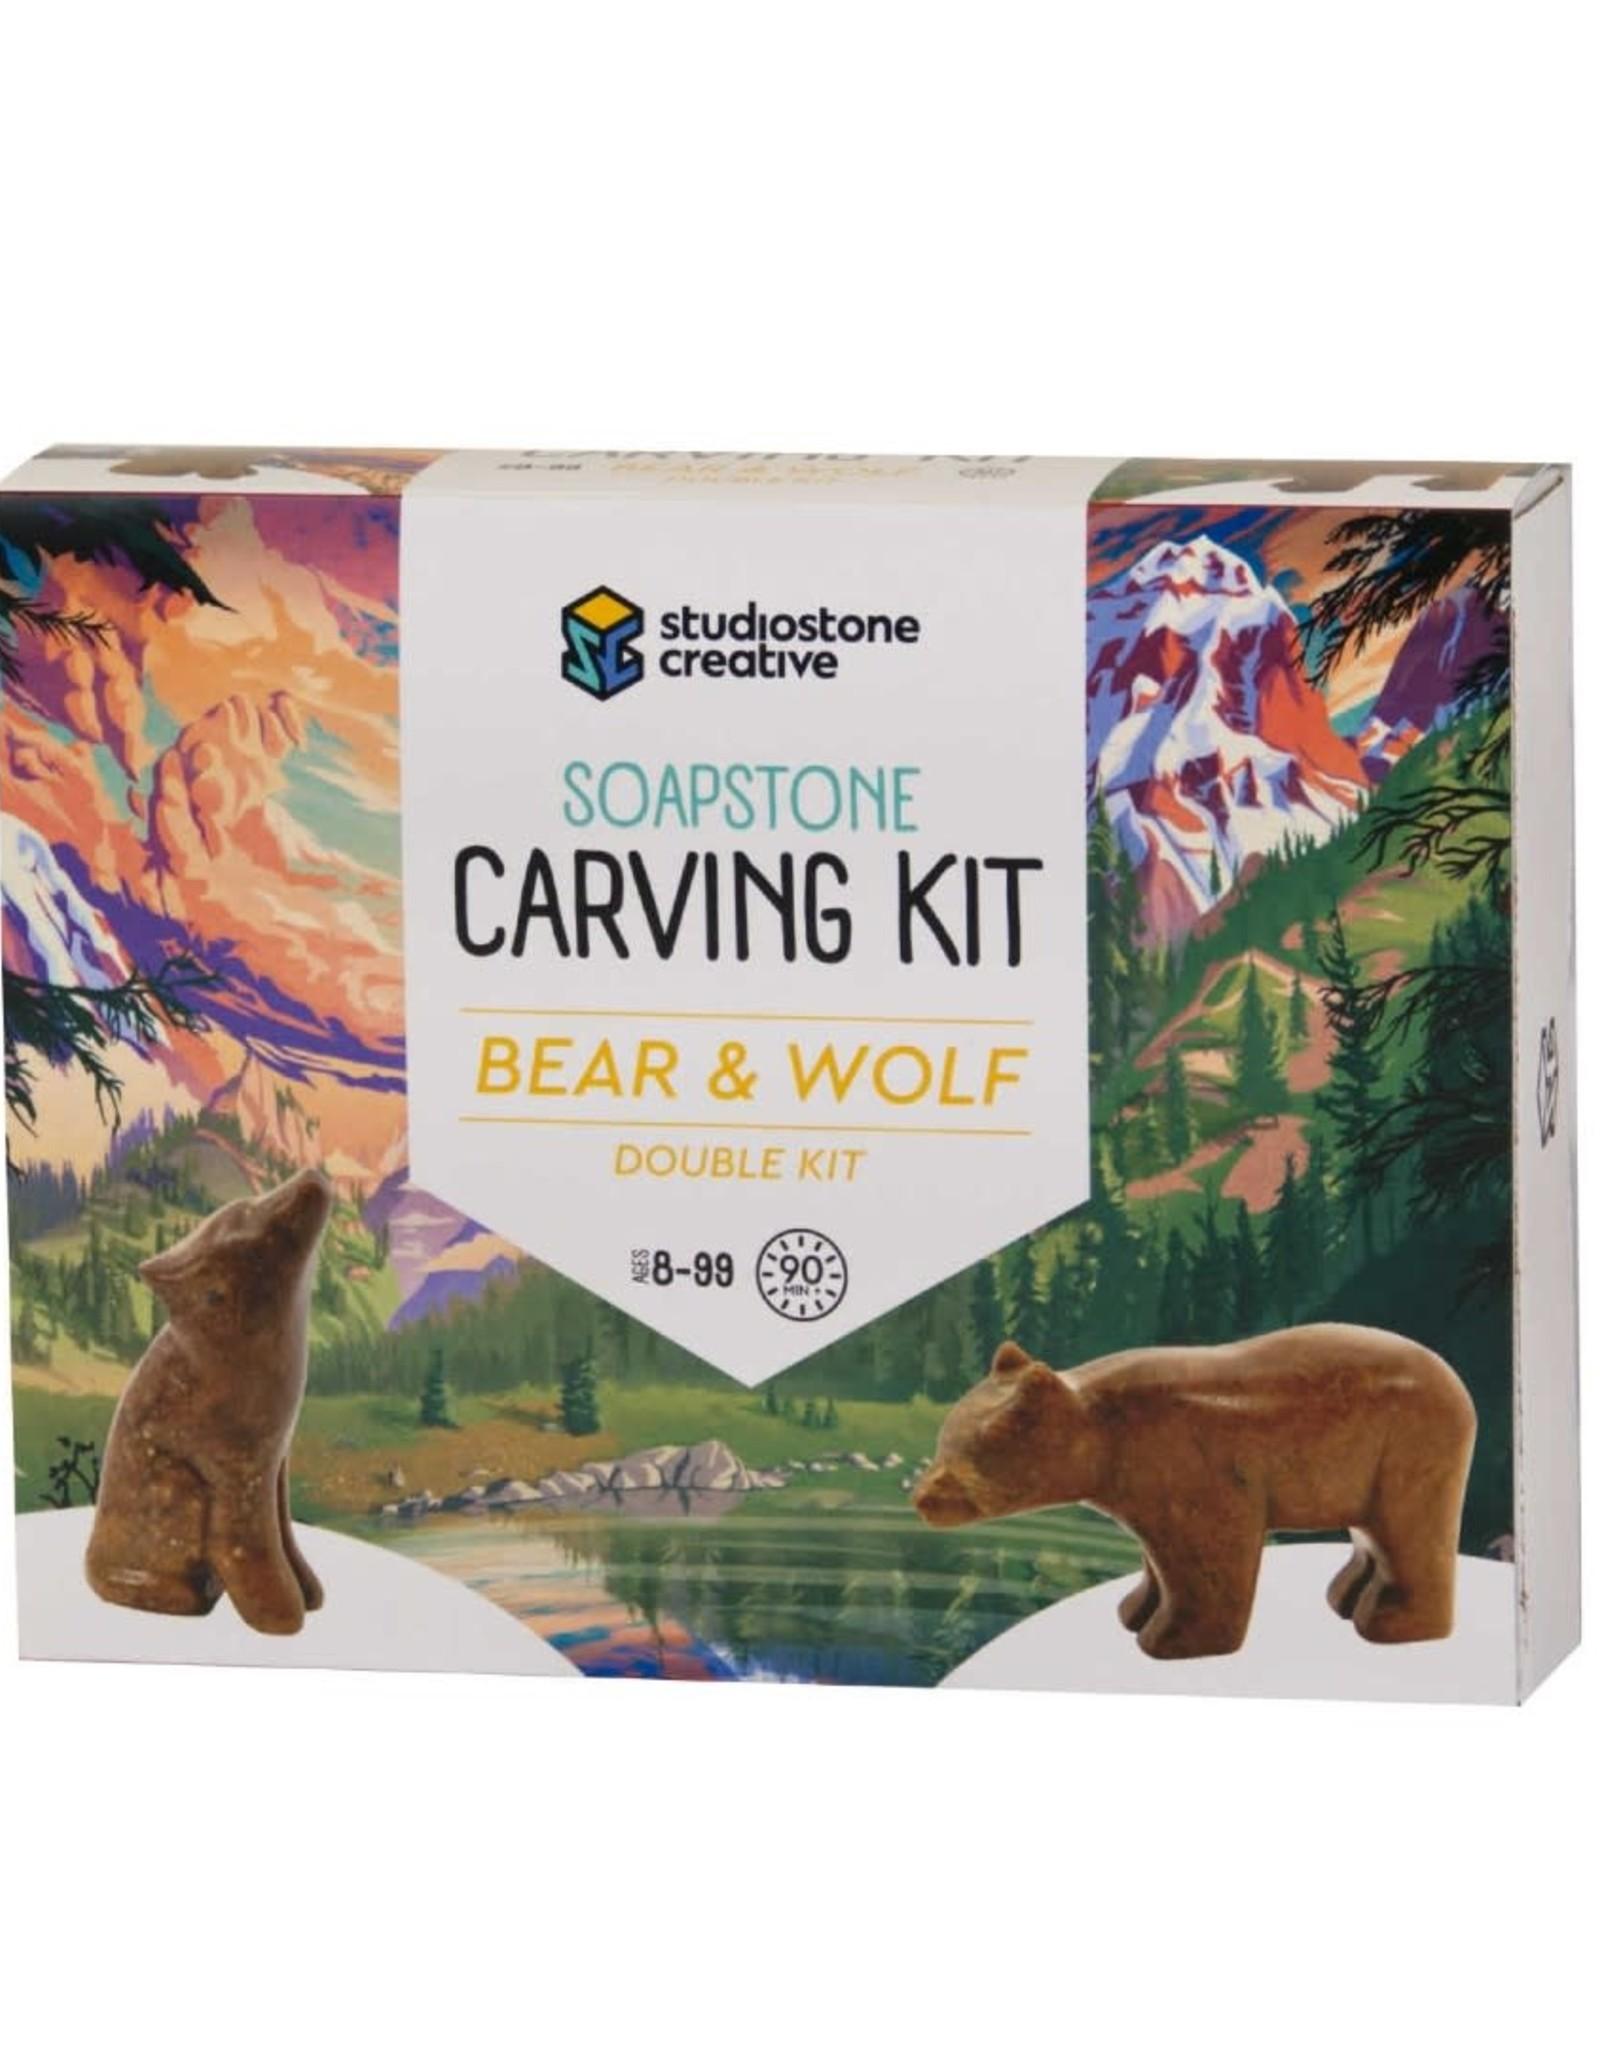 Studiostone Creative Soap stone carving kit - Bear & Wolf